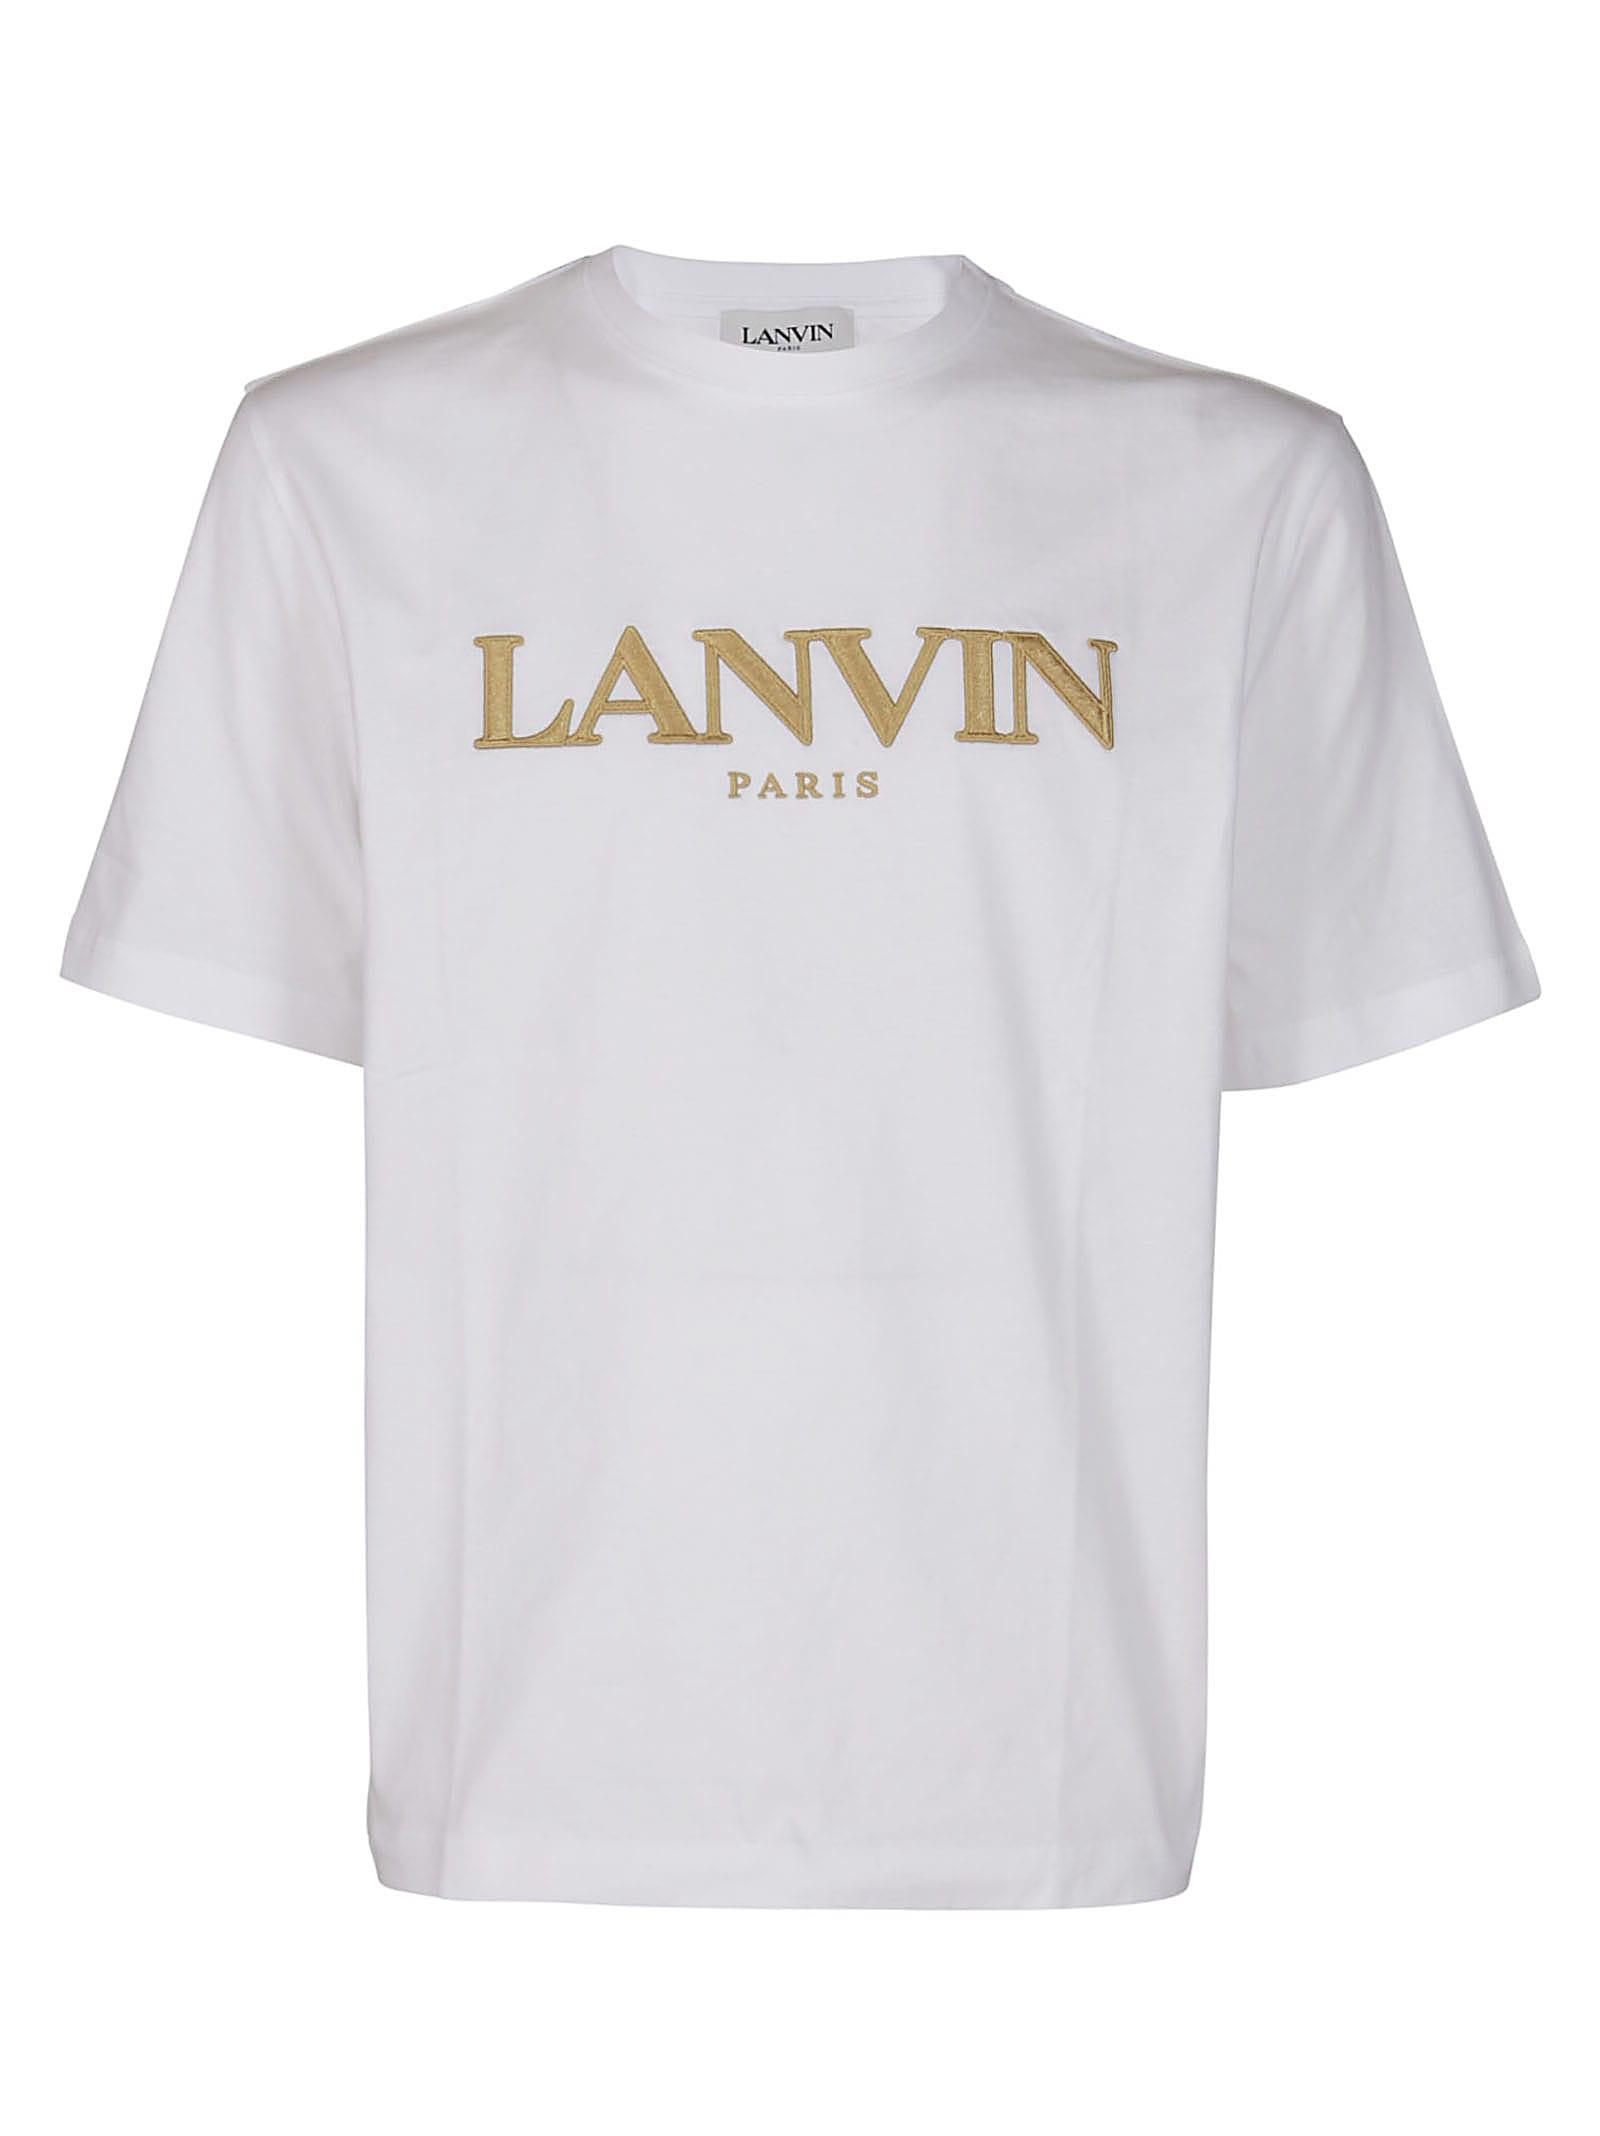 Lanvin T-shirts WHITE COTTON T-SHIRT